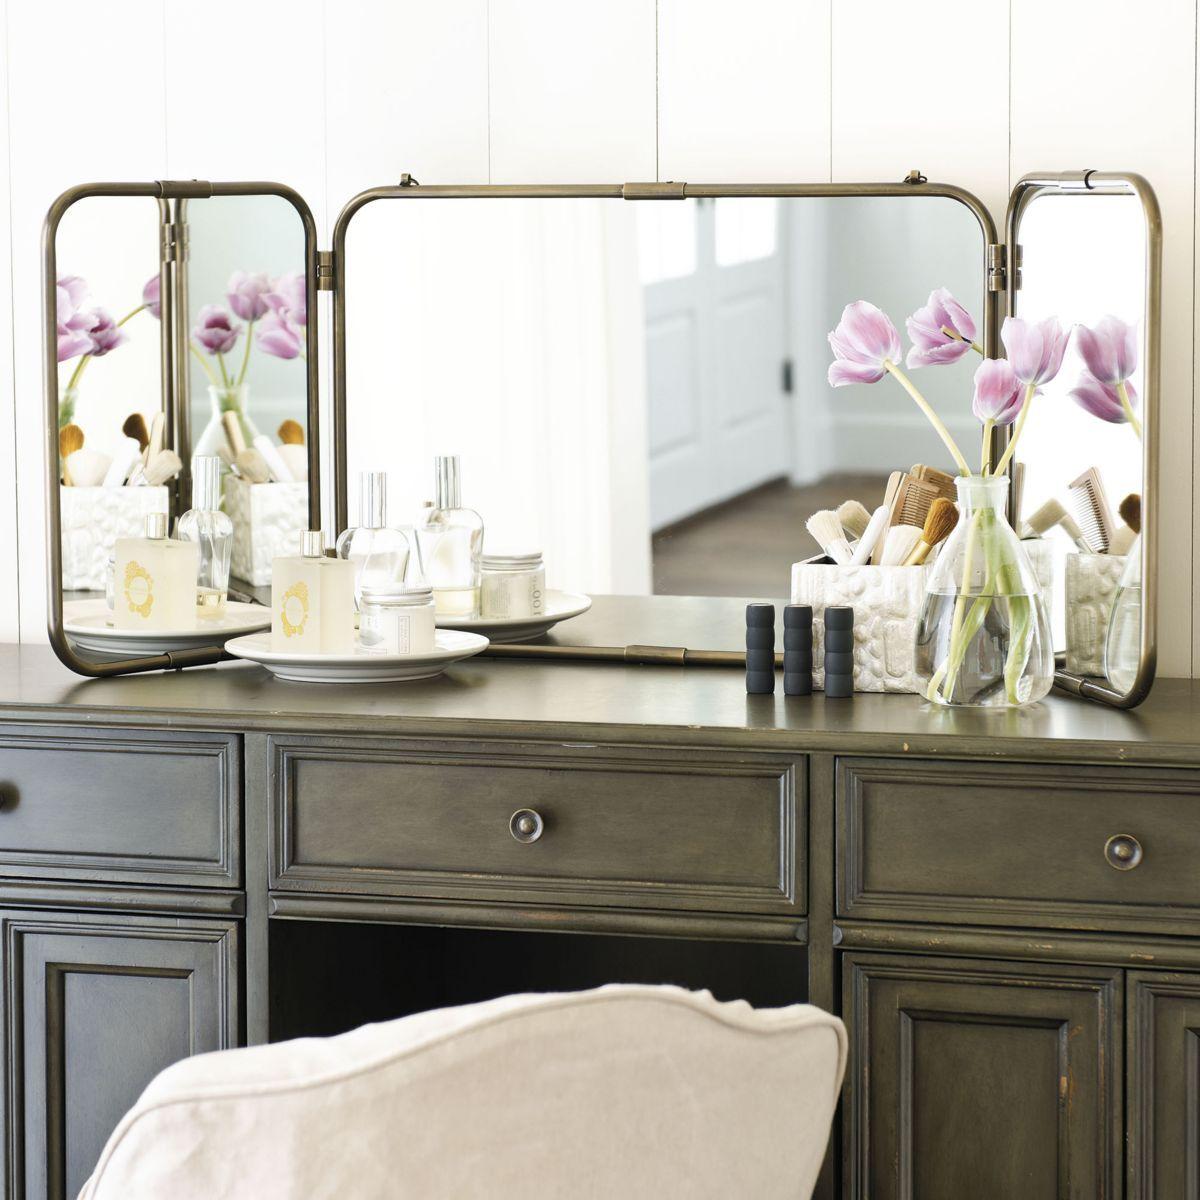 Tri Fold Vanity Mirror | For dressing room. -AM | 377 | Pinterest ...